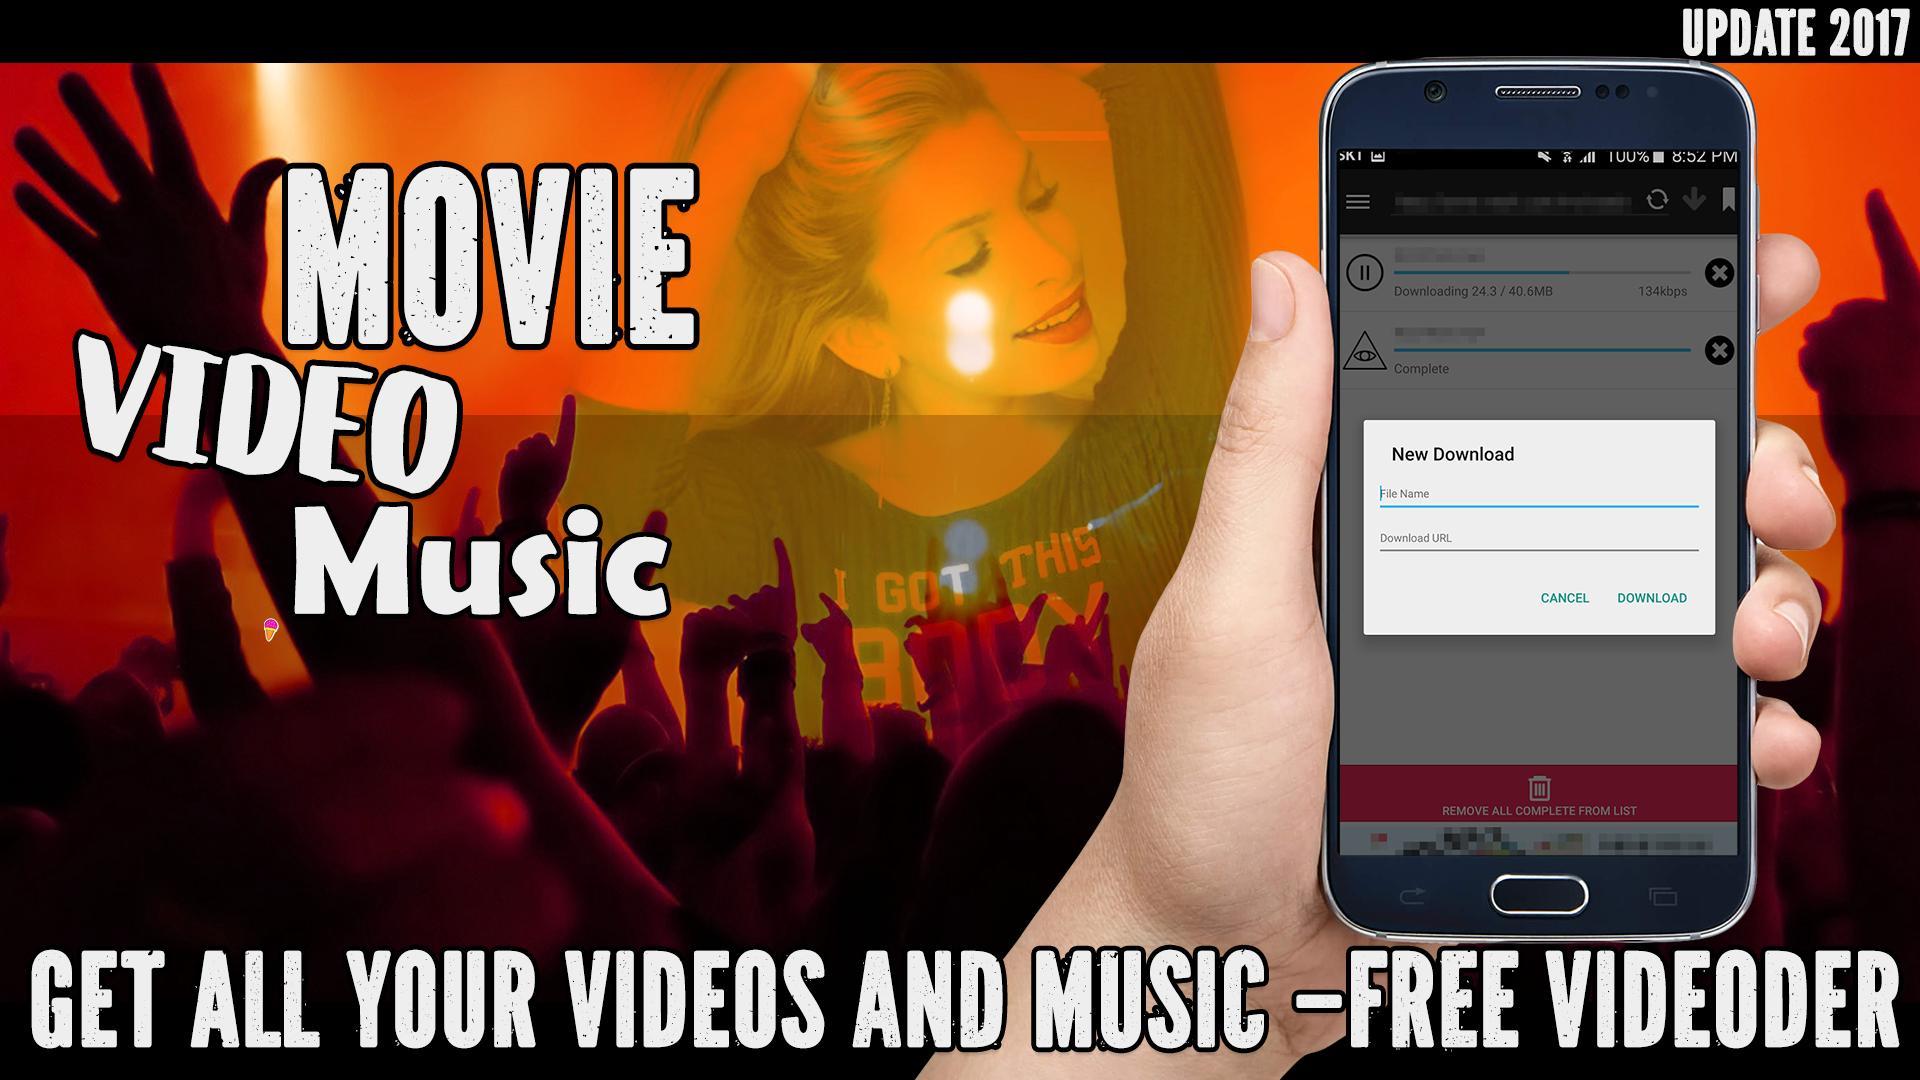 Free Videoder Video Downloader App Guide for Android - APK